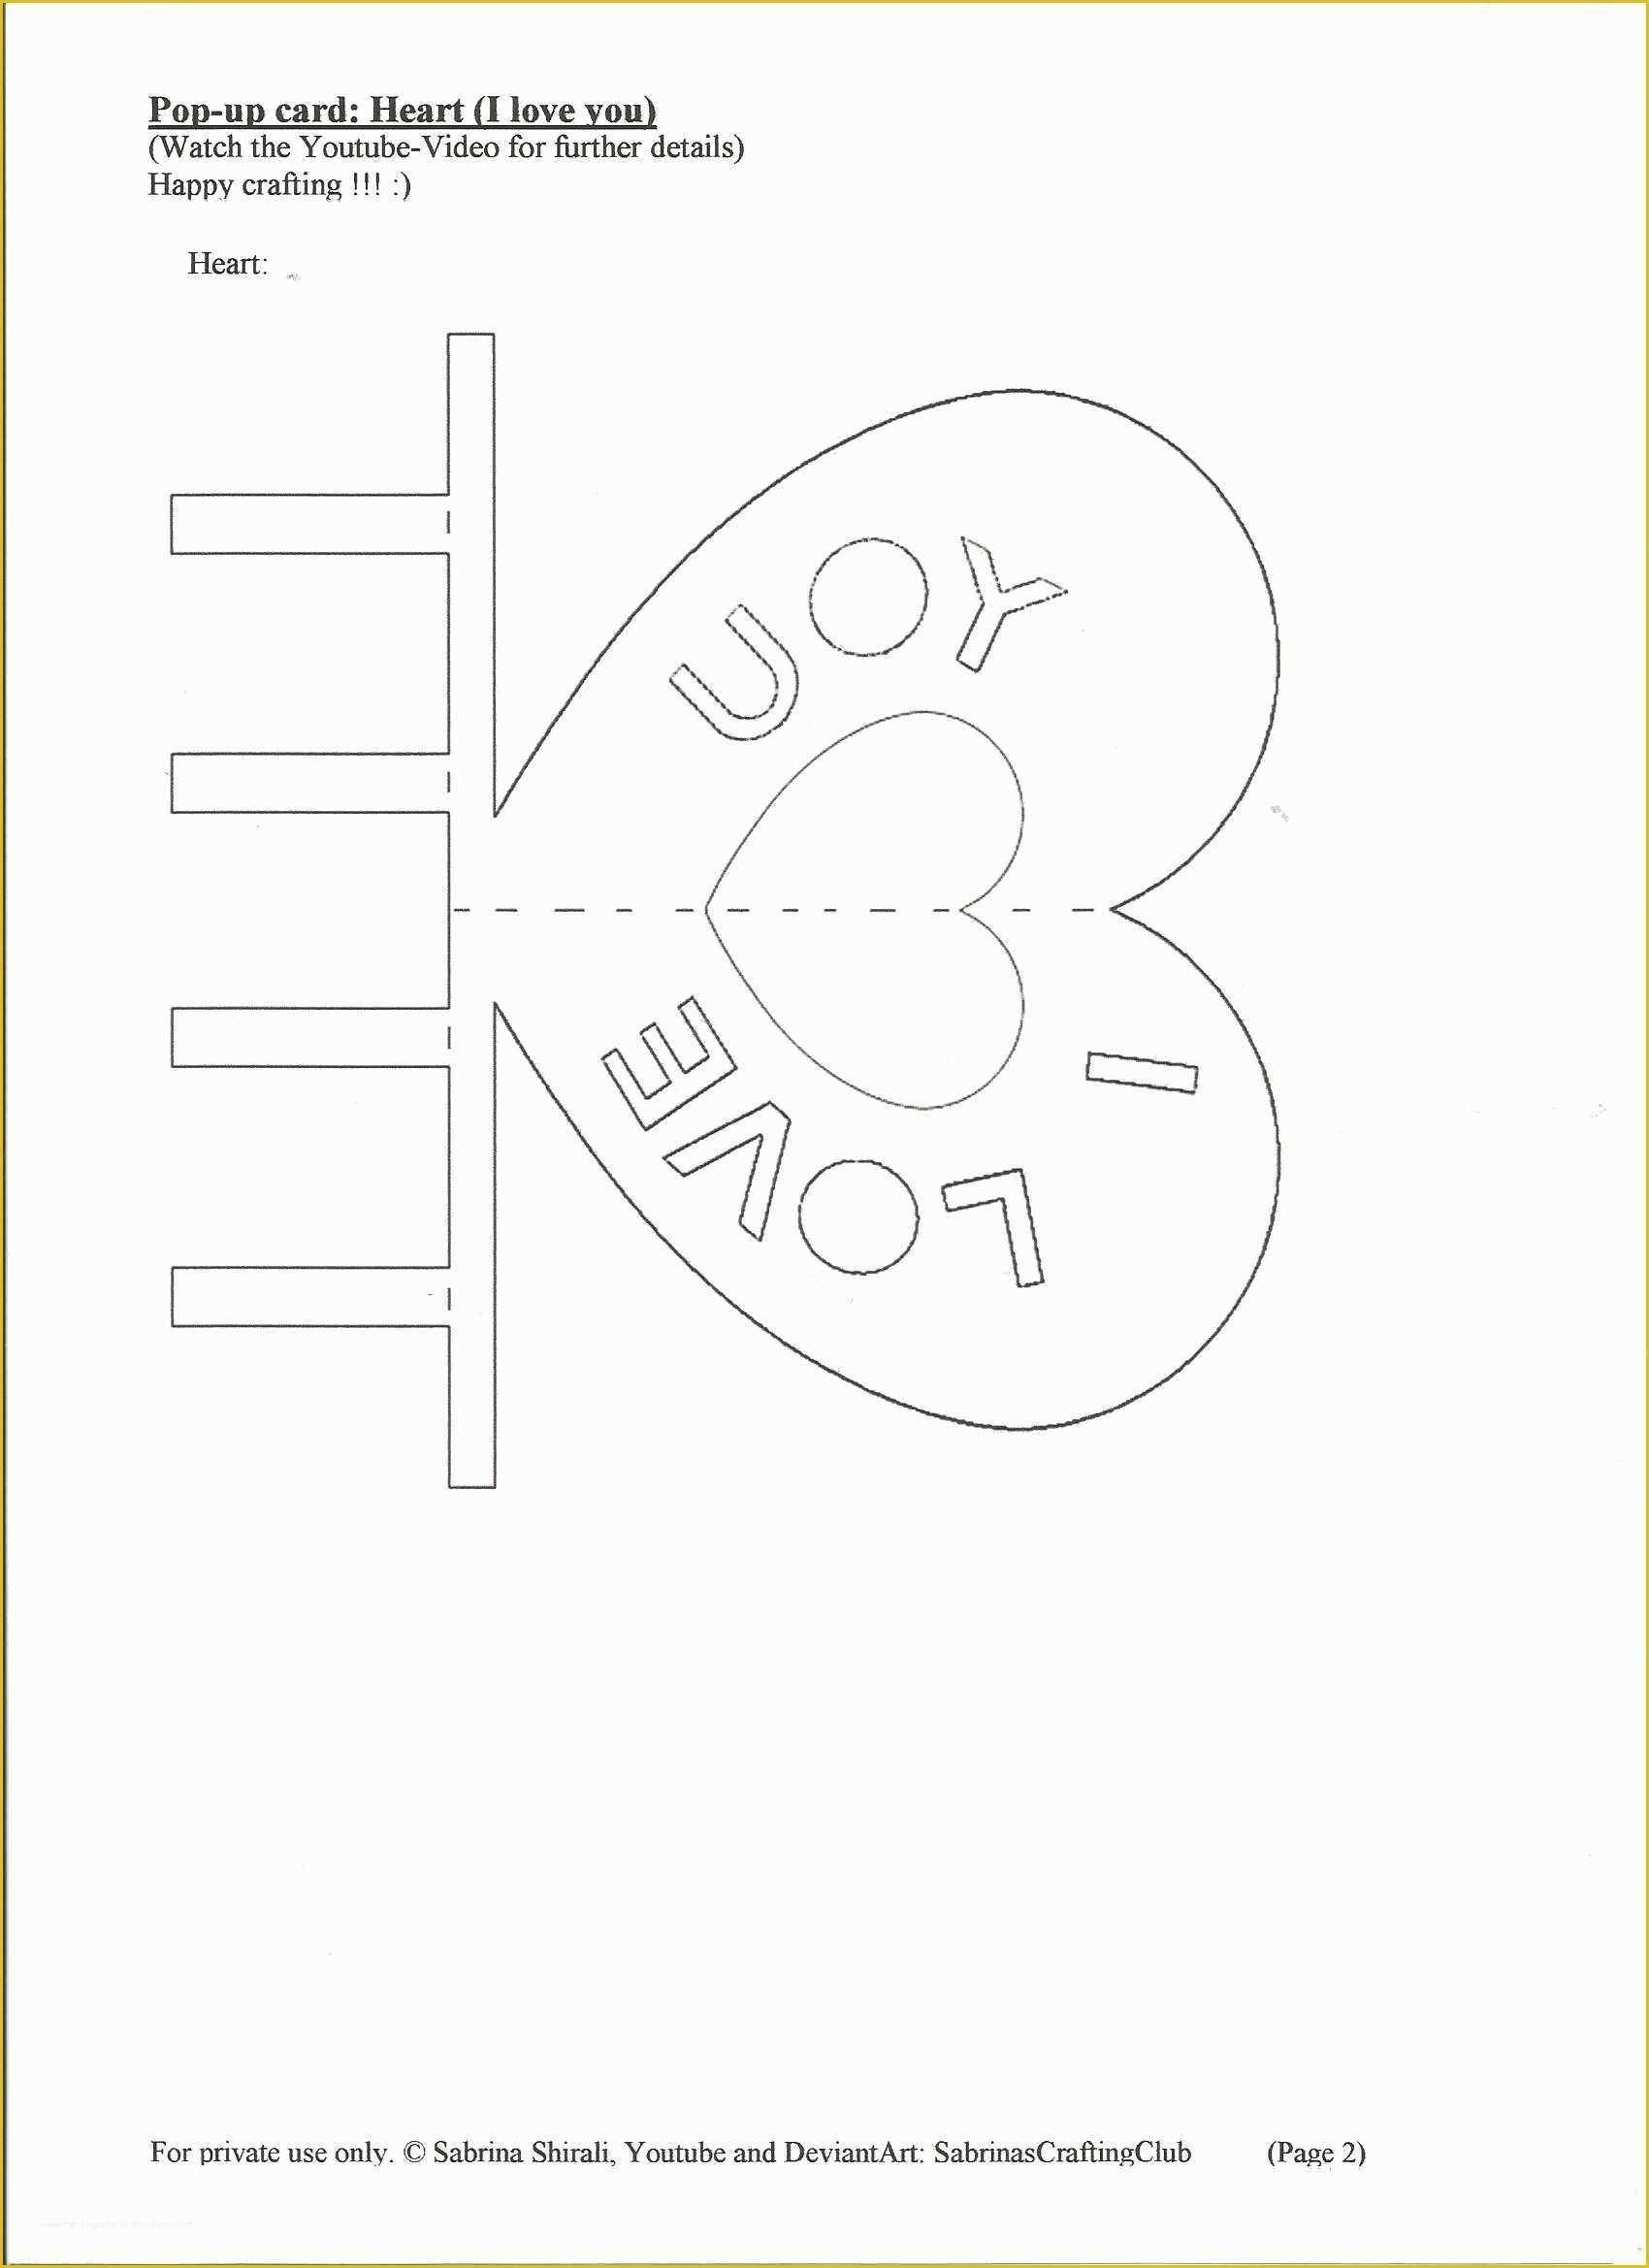 044 Template Ideas Pop Up Cards Templates Card Free Download In Free Printable Pop Up Card Templates